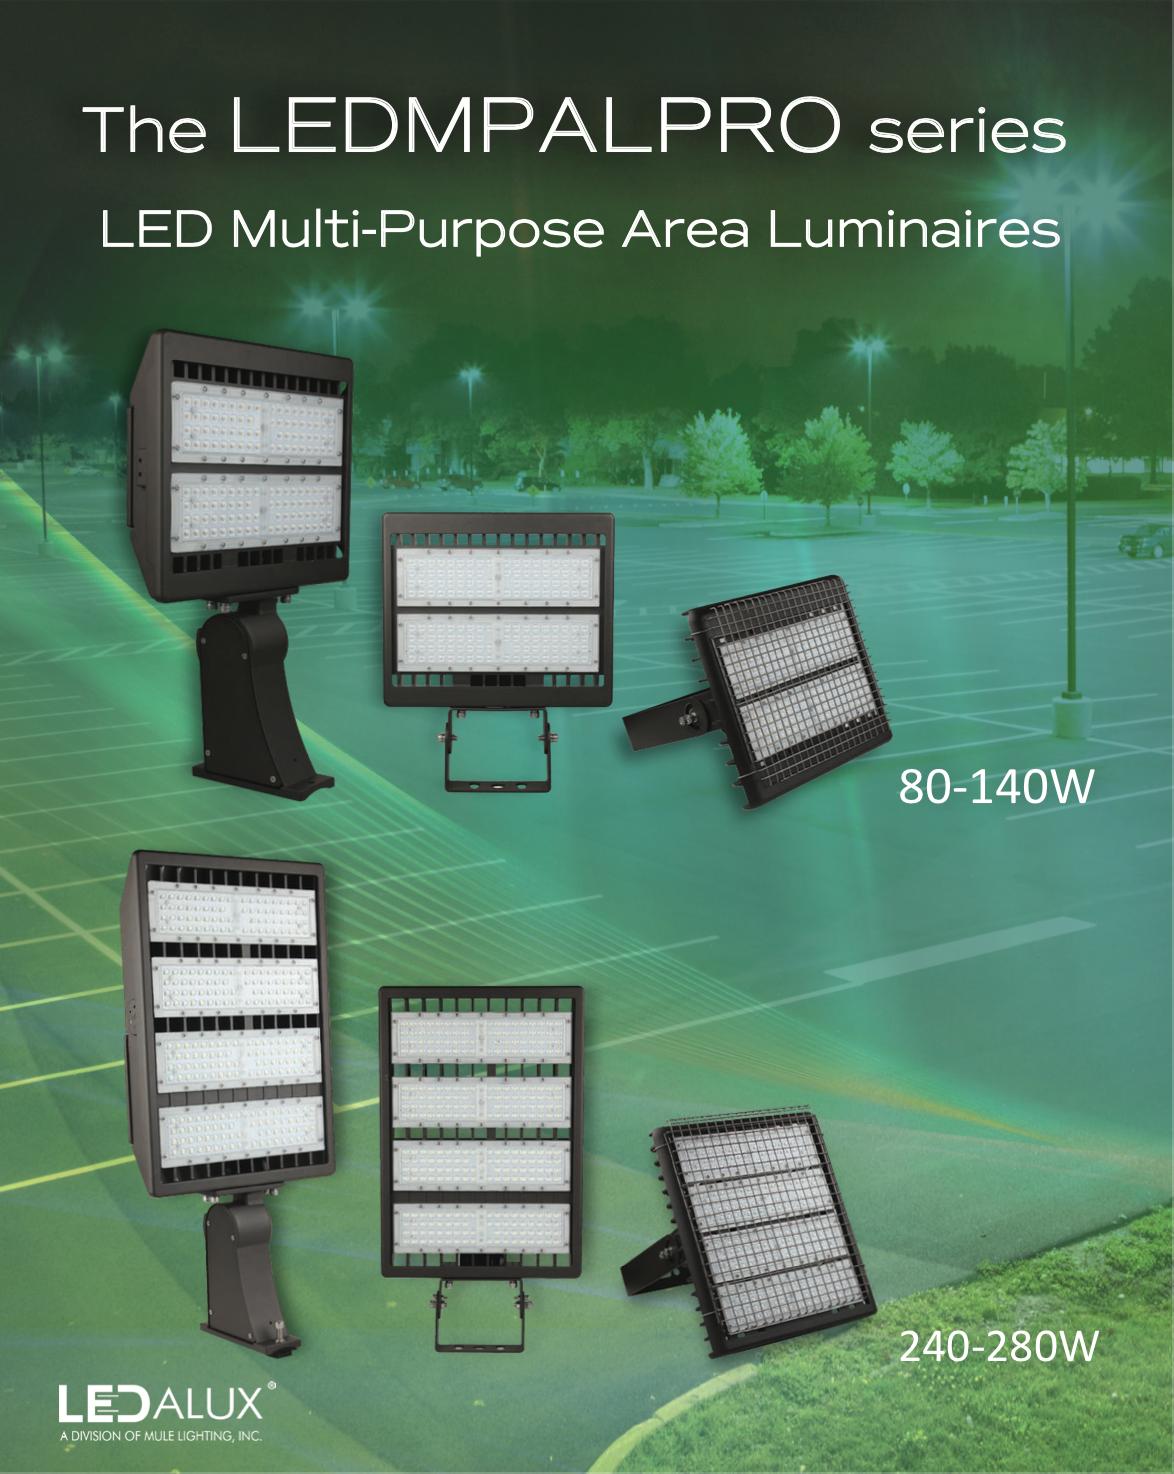 LEDalux LEDMPAL Series Sell Sheet Literature